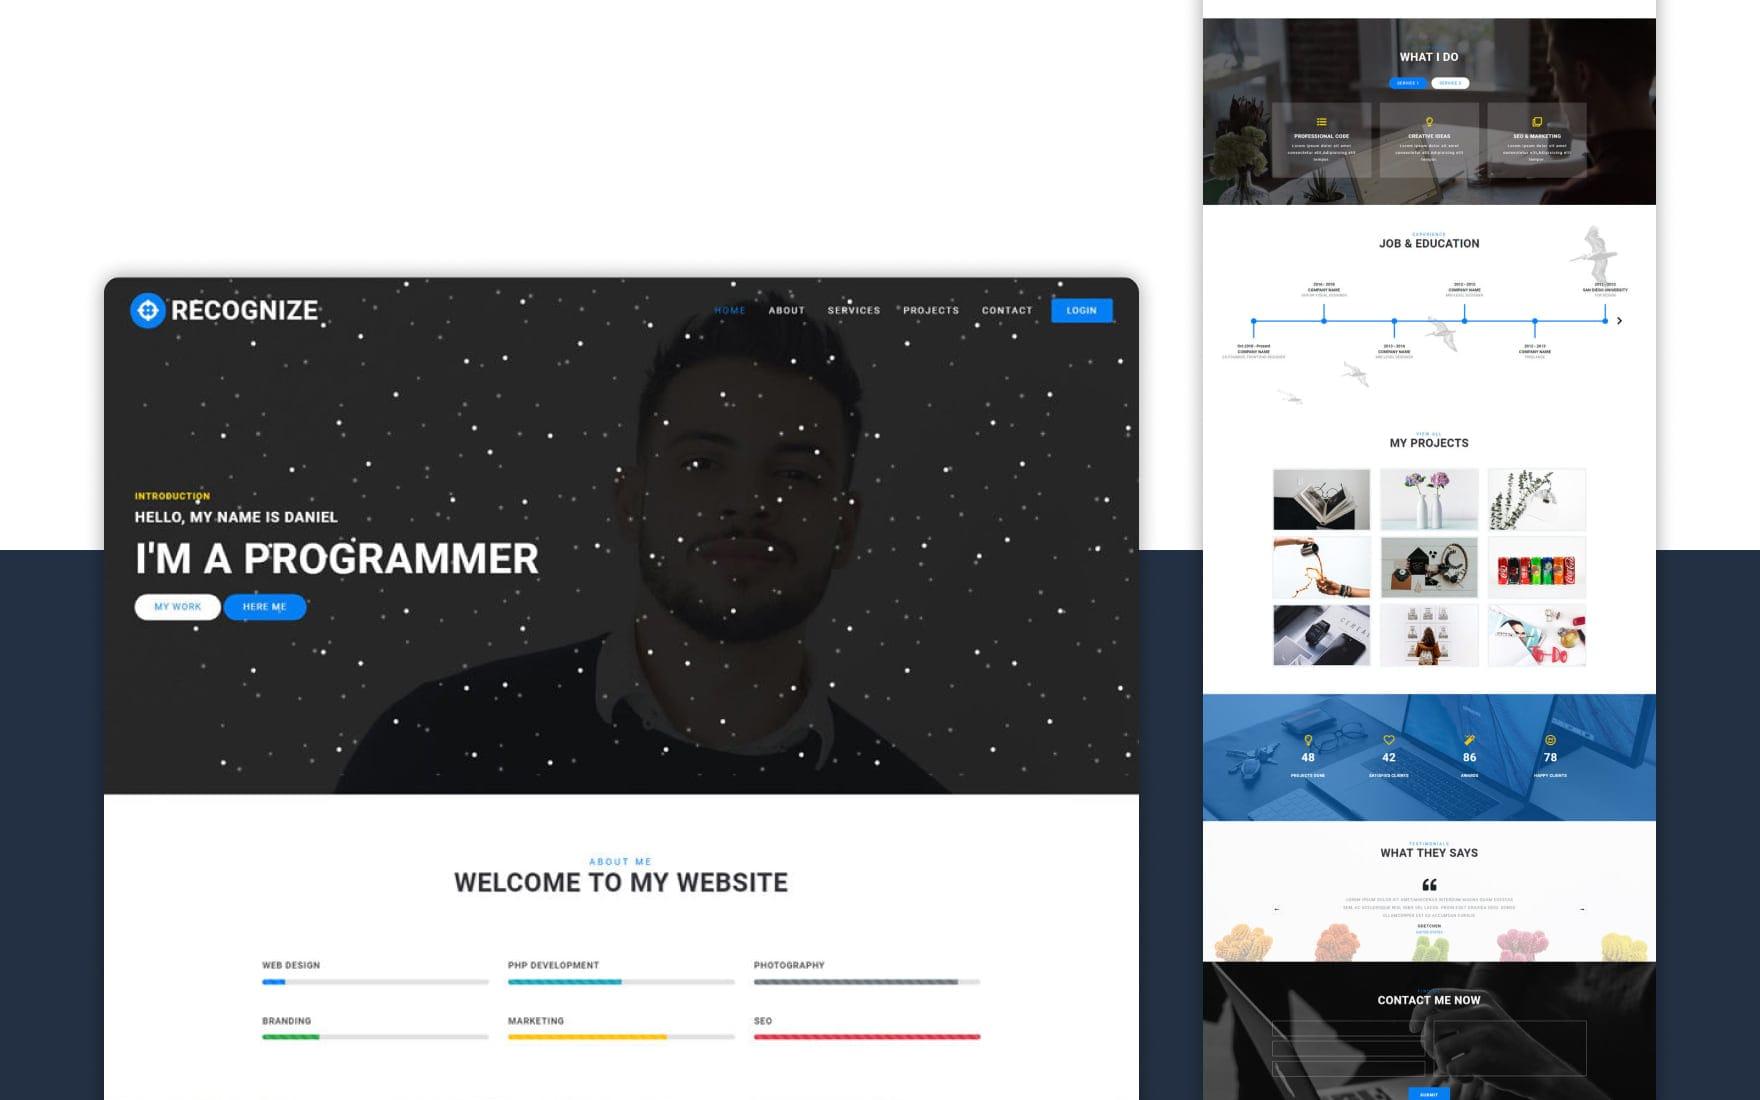 recognize-website-templates